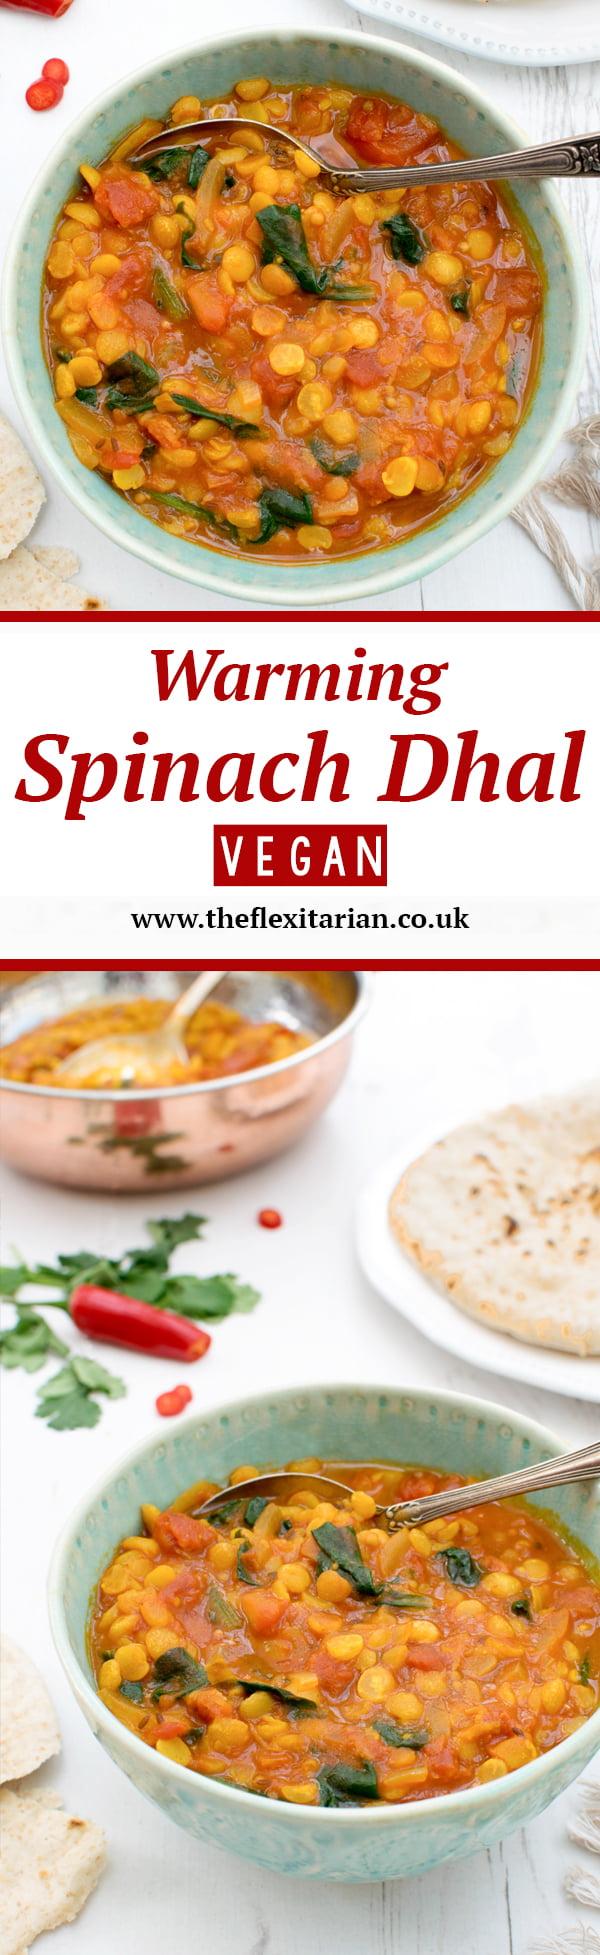 Warming Spinach Dahl [vegan] by The Flexitarian